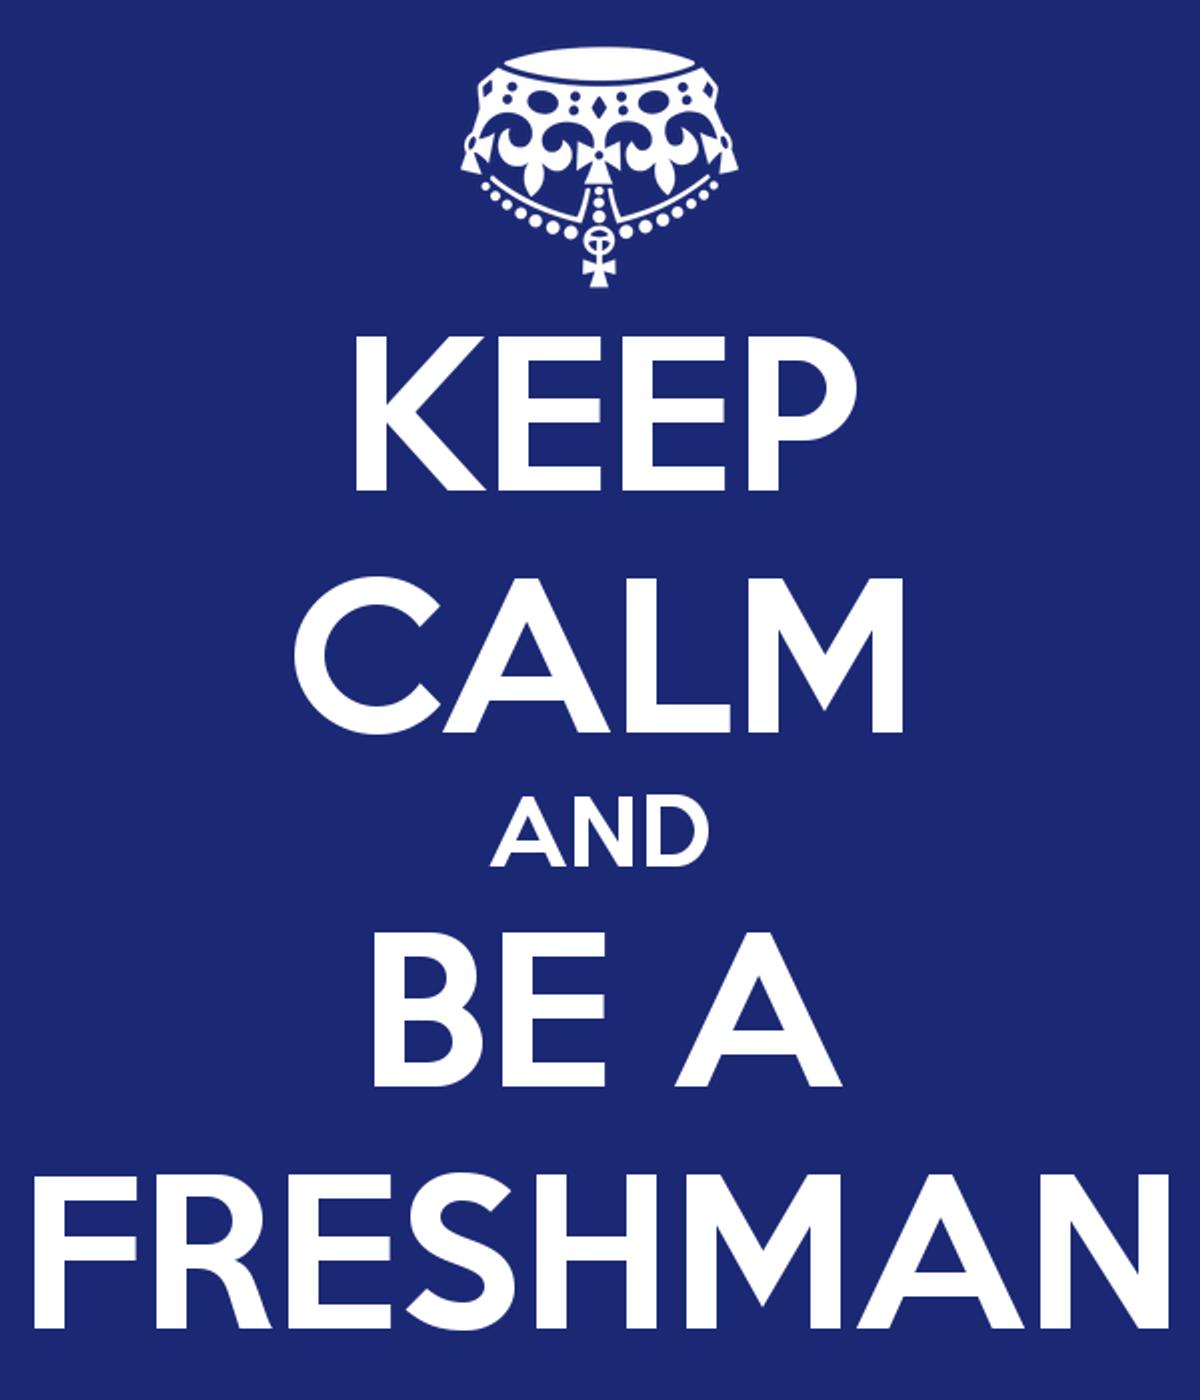 Five Freshman Life Hacks for LOYNO Students